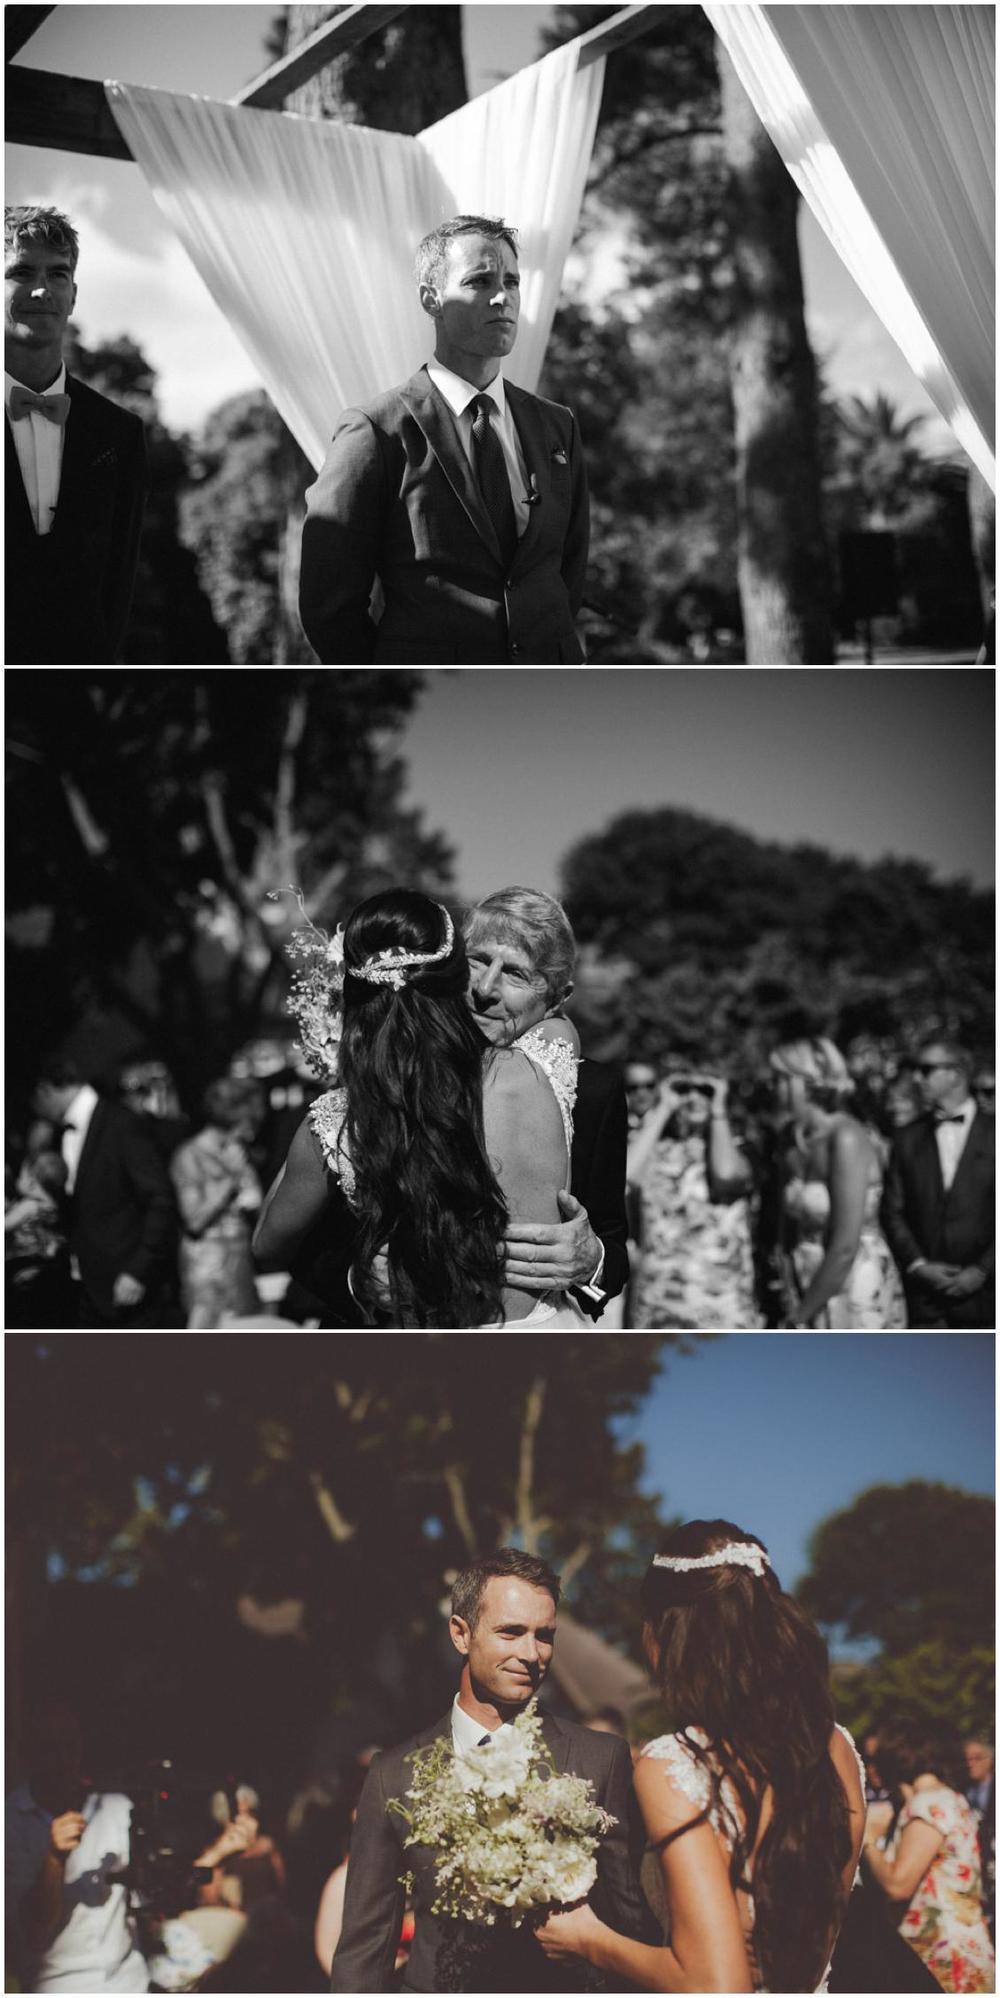 Brandon&Bianca_Constantia_Fionaclairphotography-117.jpg